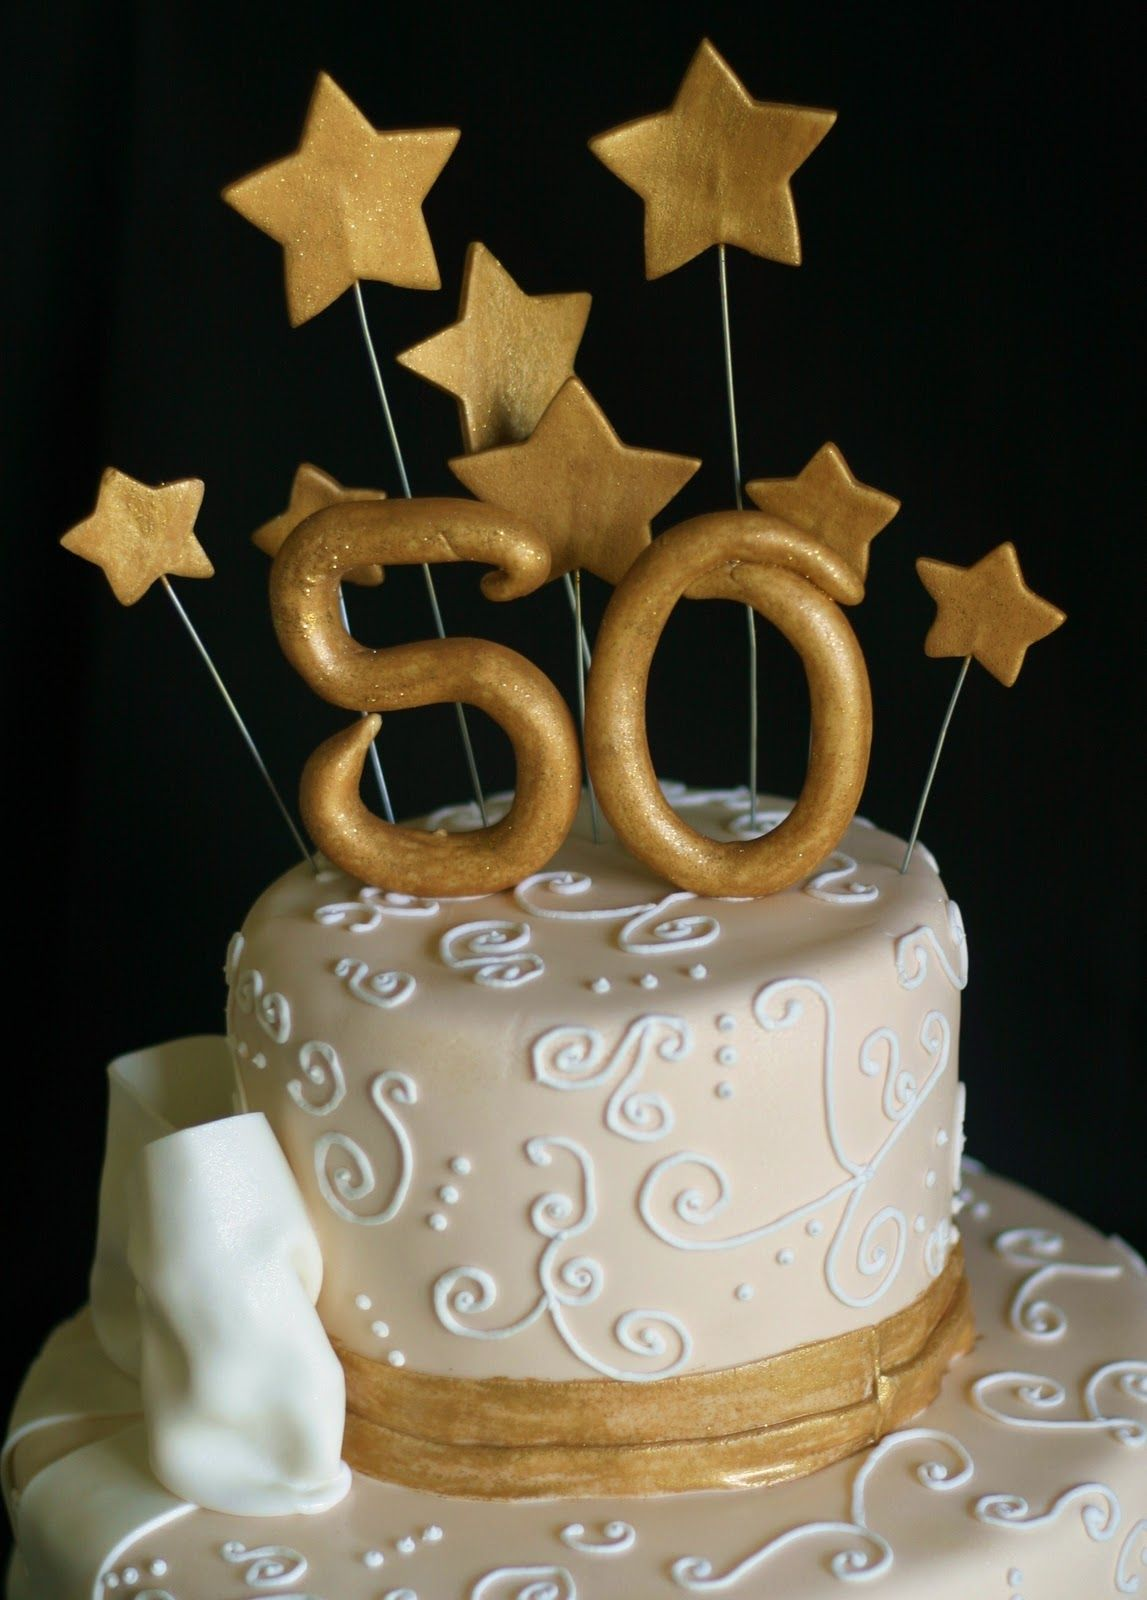 Fun 50th birthday cake 50th birthday party ideas for 50th birthday cake decoration